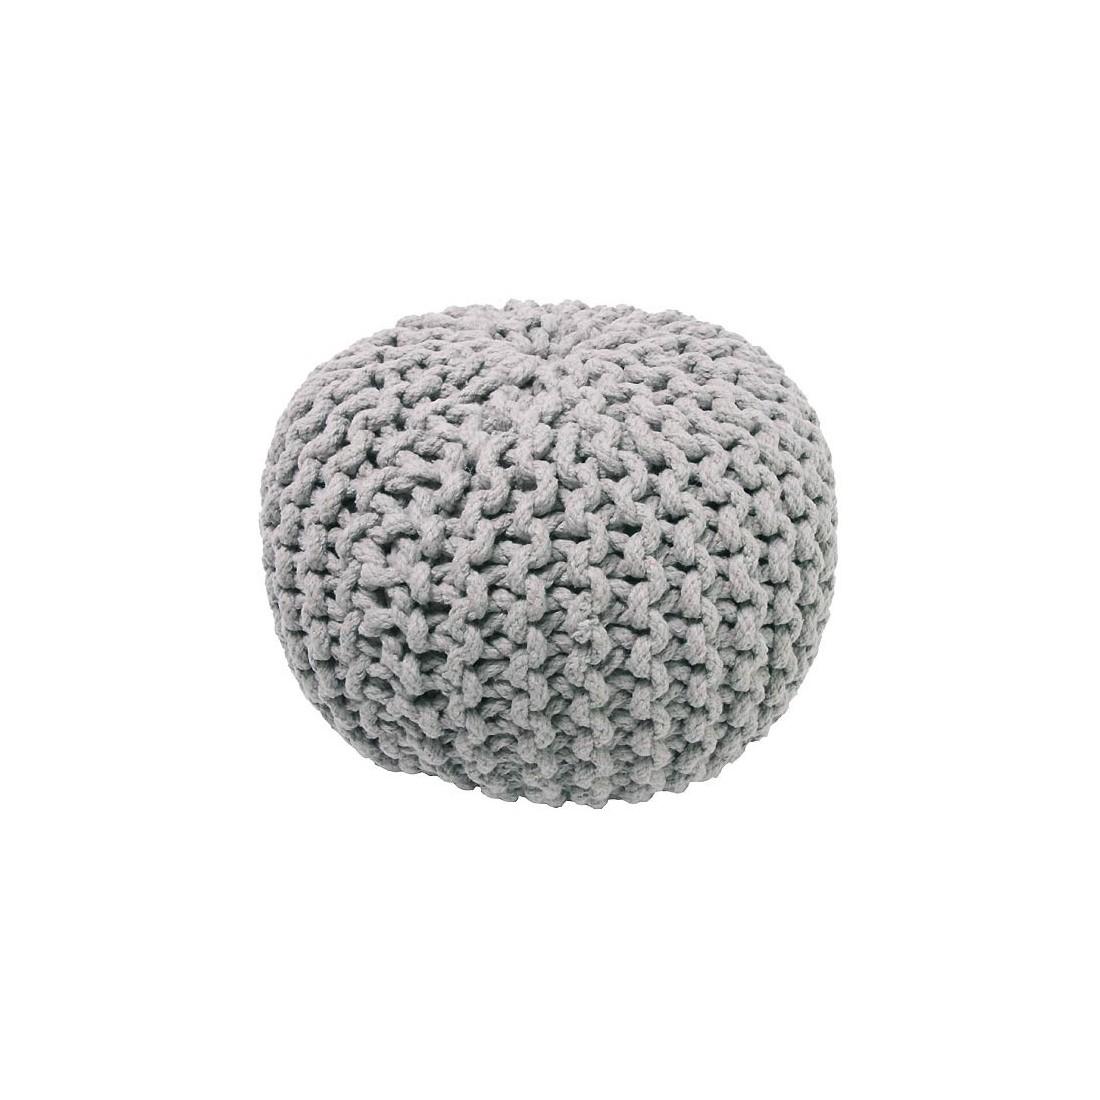 pouf enfant coton effet maille tricot lili gris nattiot ma chambramoi. Black Bedroom Furniture Sets. Home Design Ideas